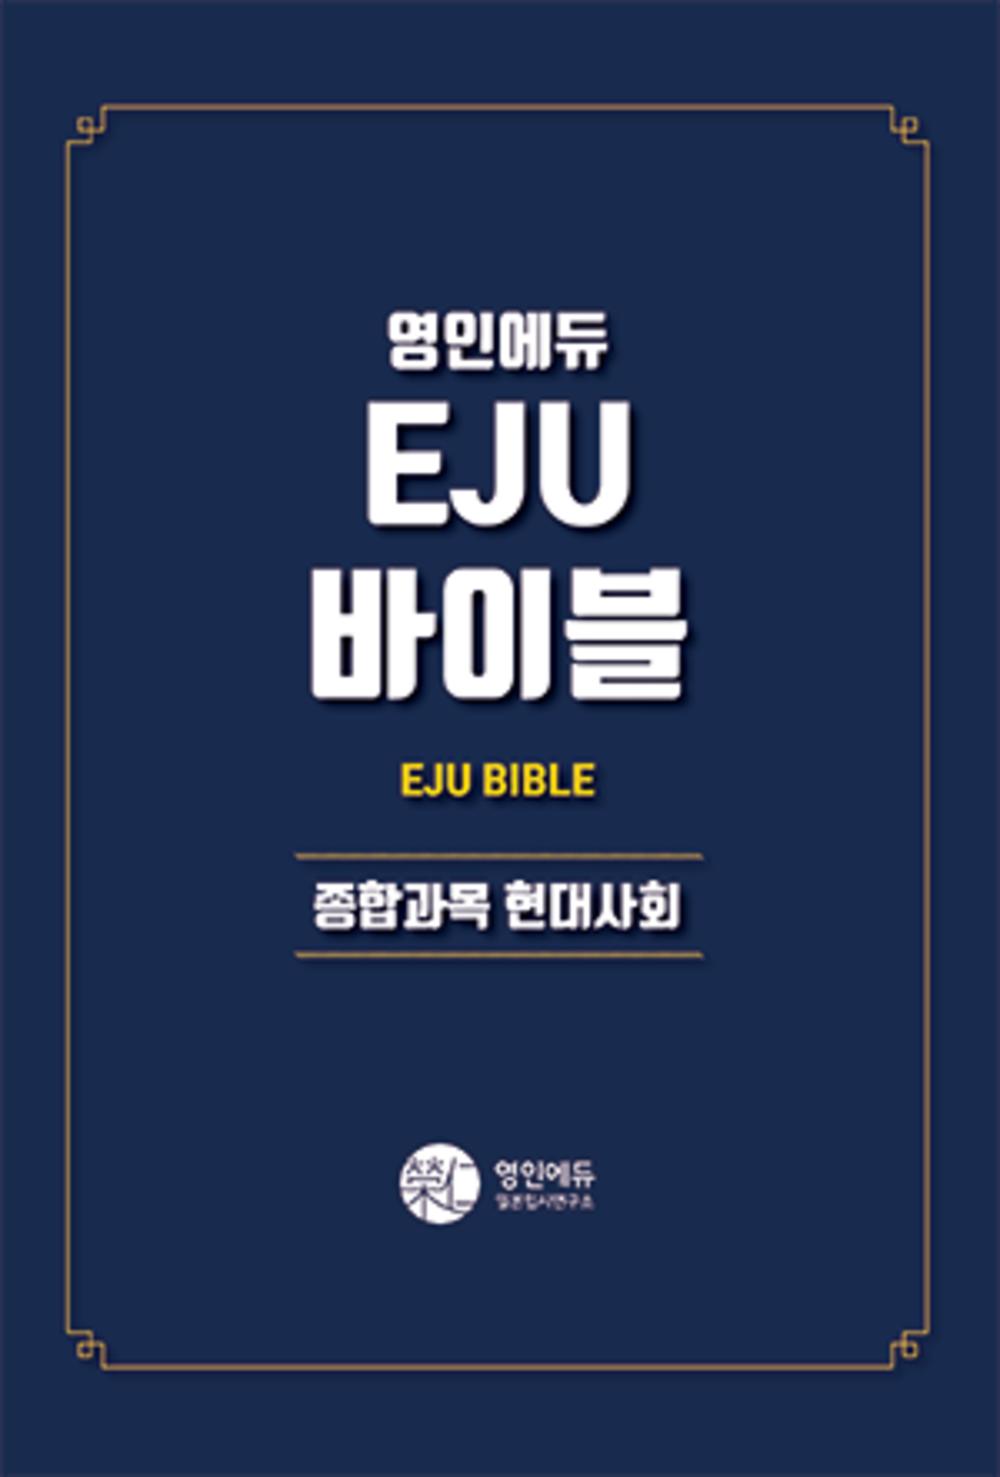 EJU 바이블_종합과목_현대사회  (교재만 개별 구매  불가)